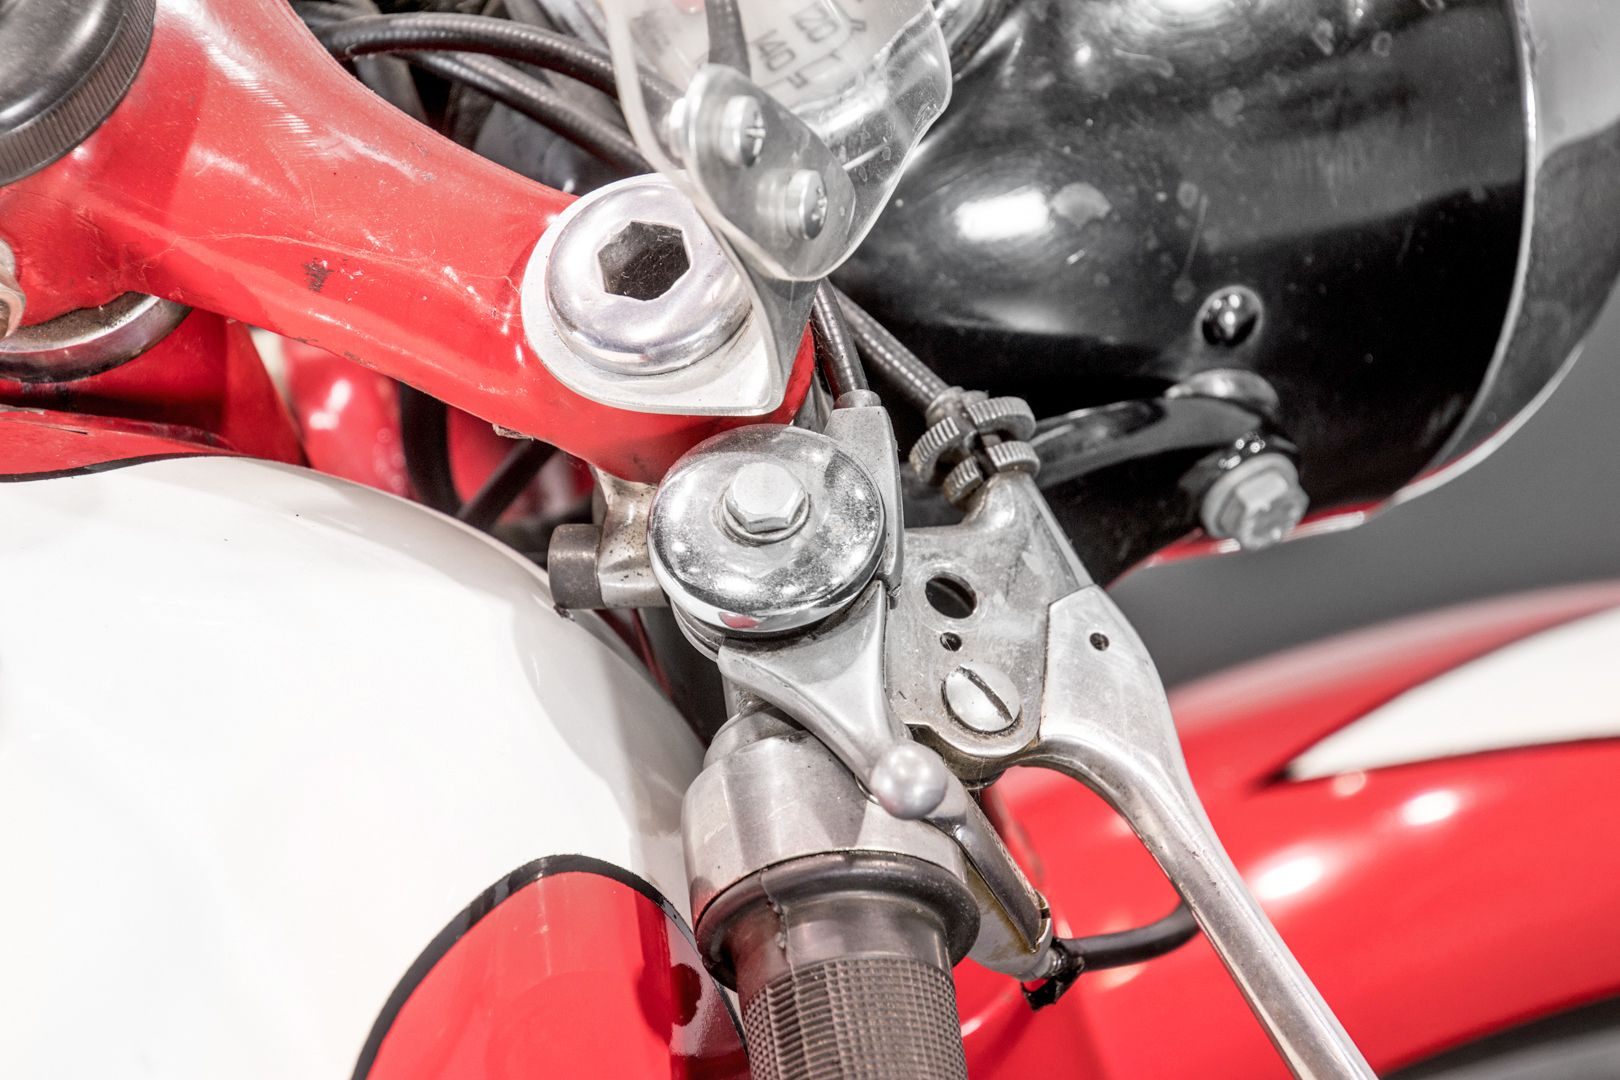 1957 Moto Morini 175 71741